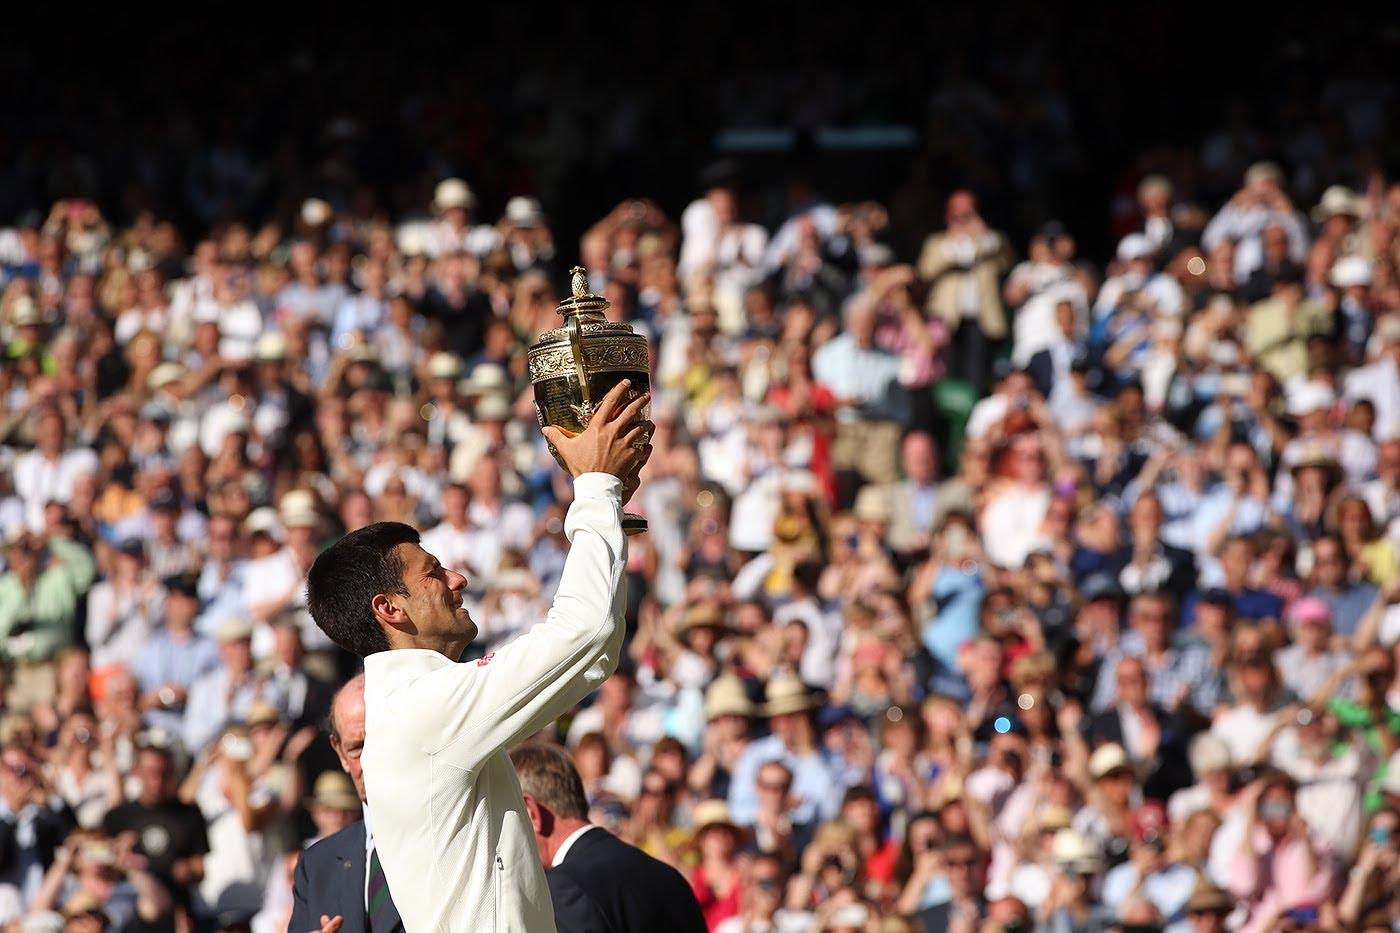 Video: Novak Djokovic – Roger Federer (6:7, 6:4, 7:6, 5:7, 6:4 ), Wimbledon 2014